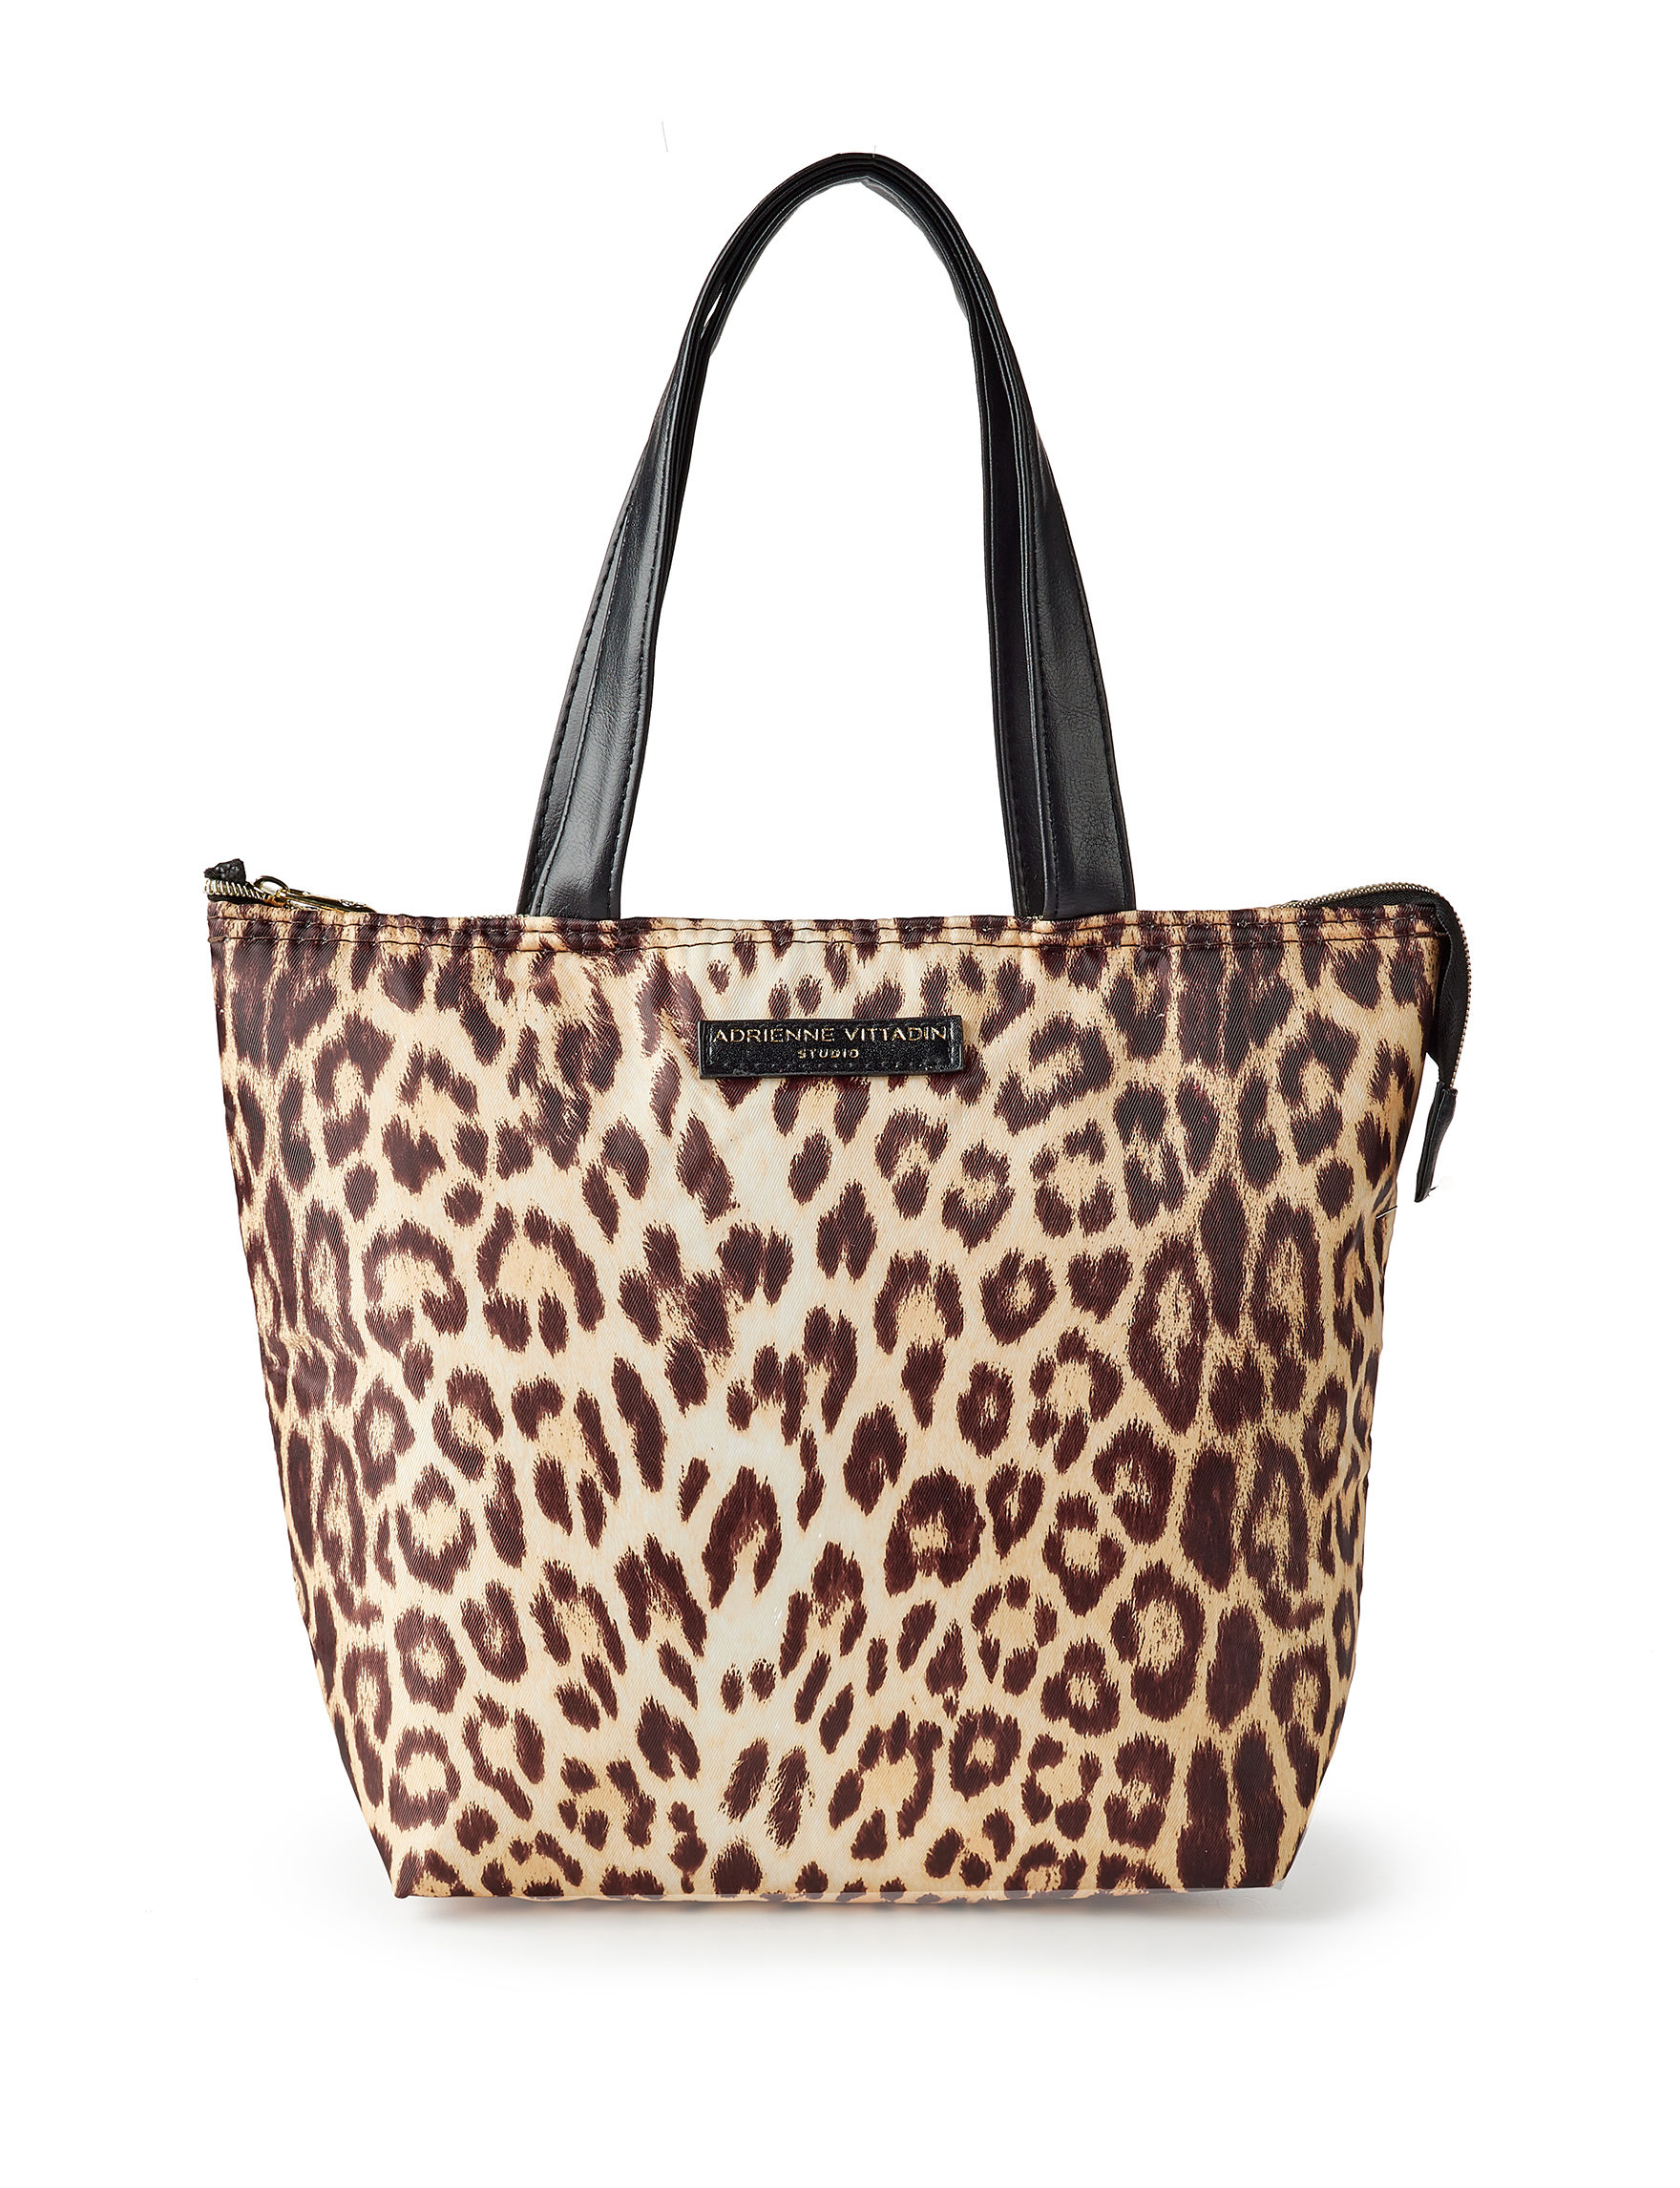 Adrienne Vittadini Leopard Lunch Boxes & Bags Kitchen Storage & Organization